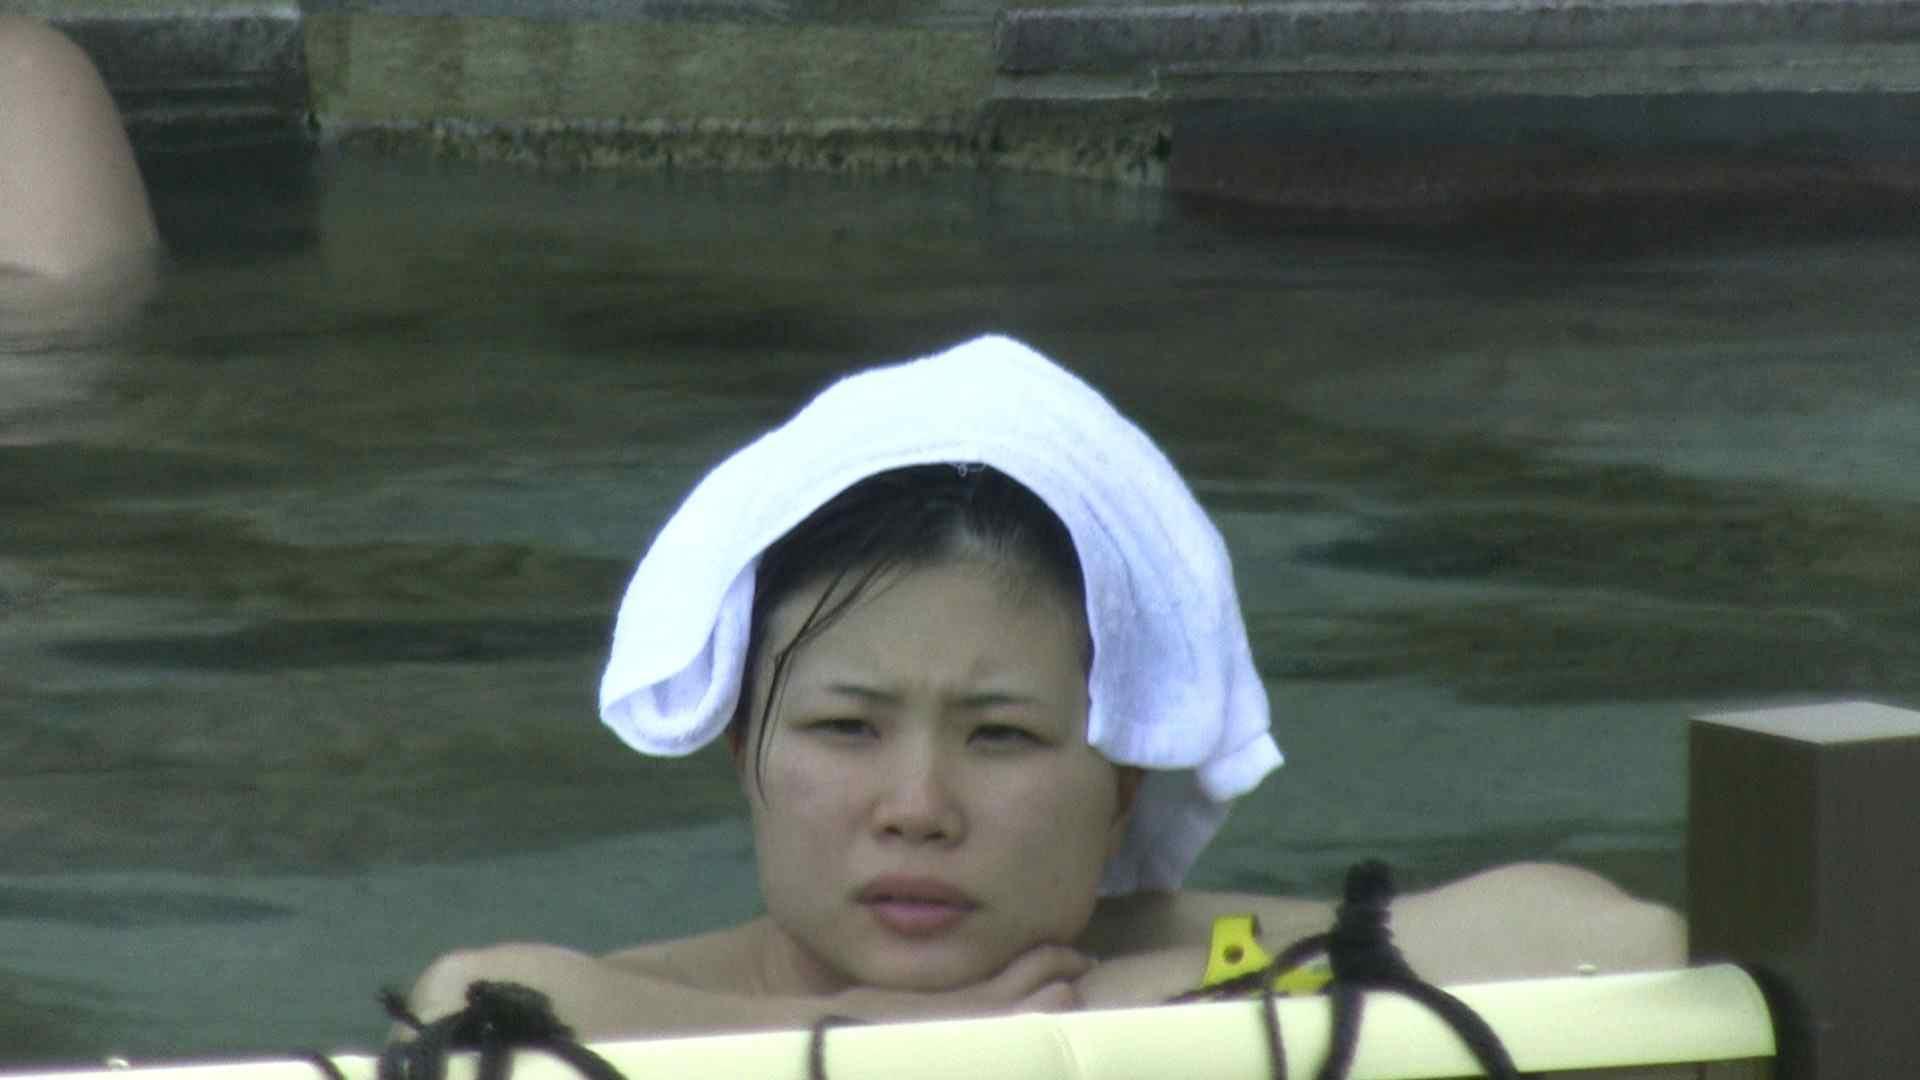 Aquaな露天風呂Vol.183 盗撮 おまんこ無修正動画無料 53枚 23